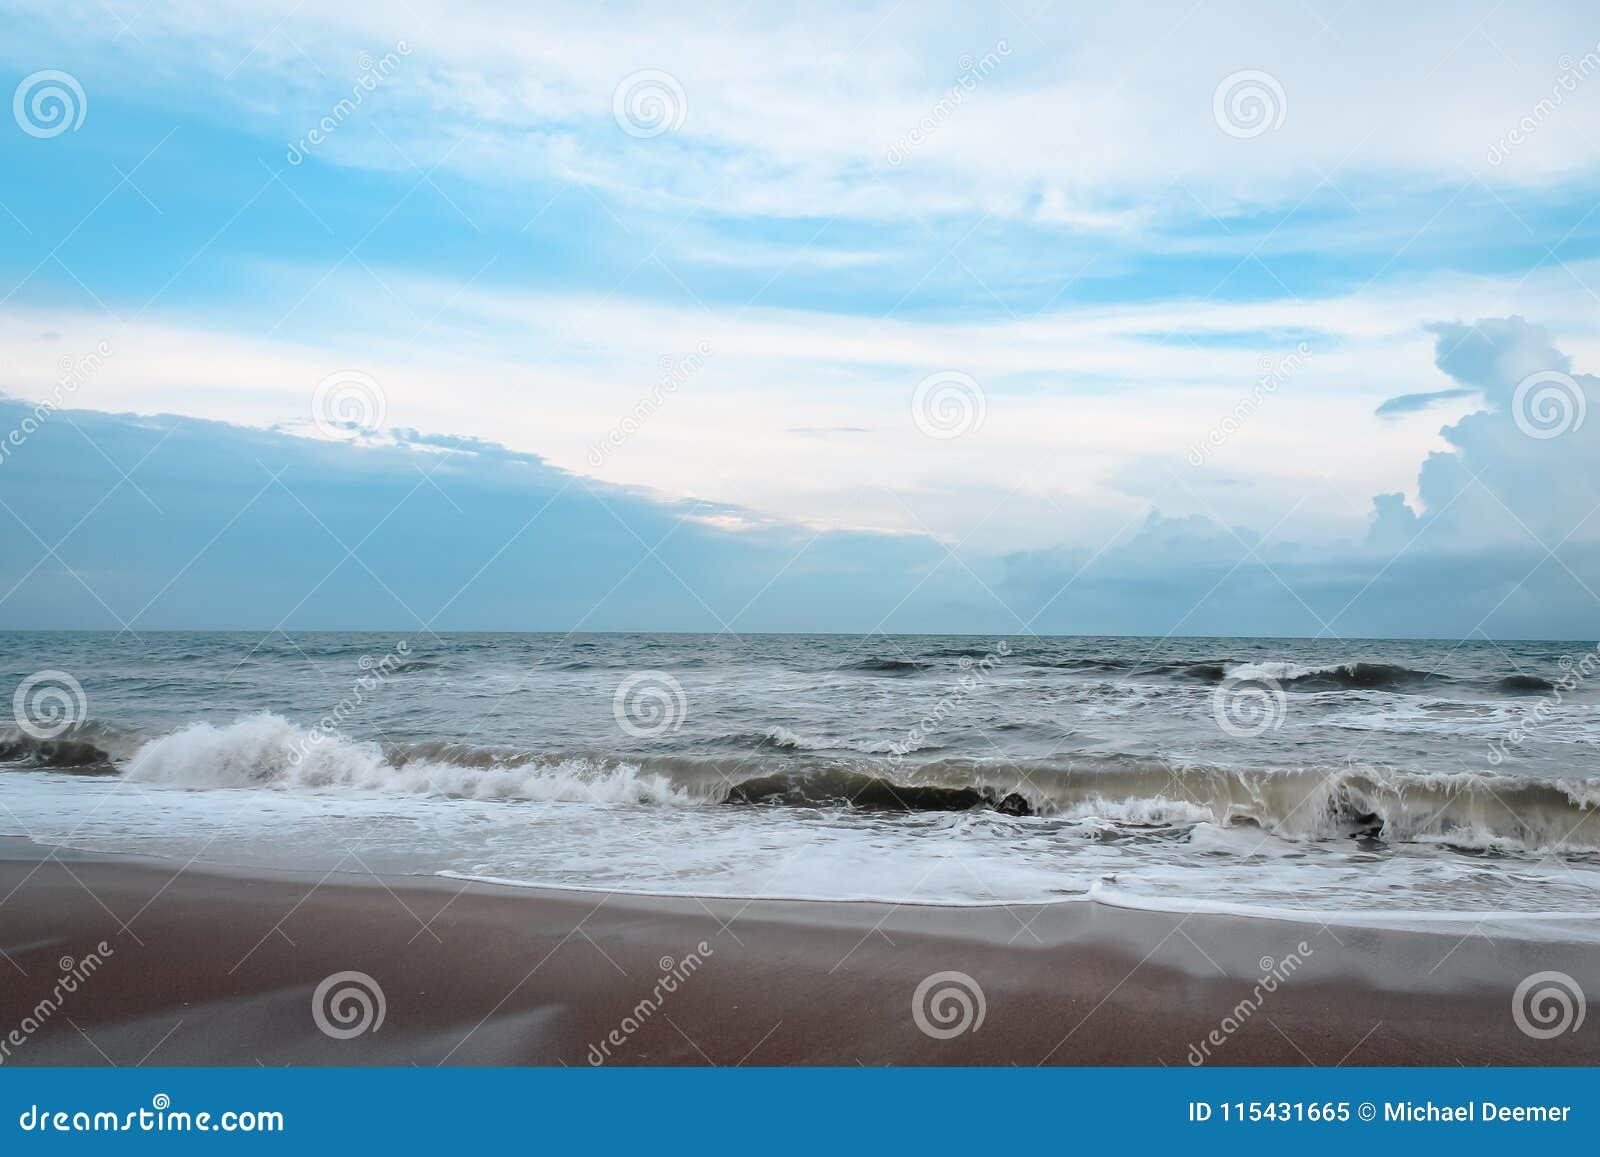 Waves Crashing In On A North Carolina Beach Stock Image - Image of